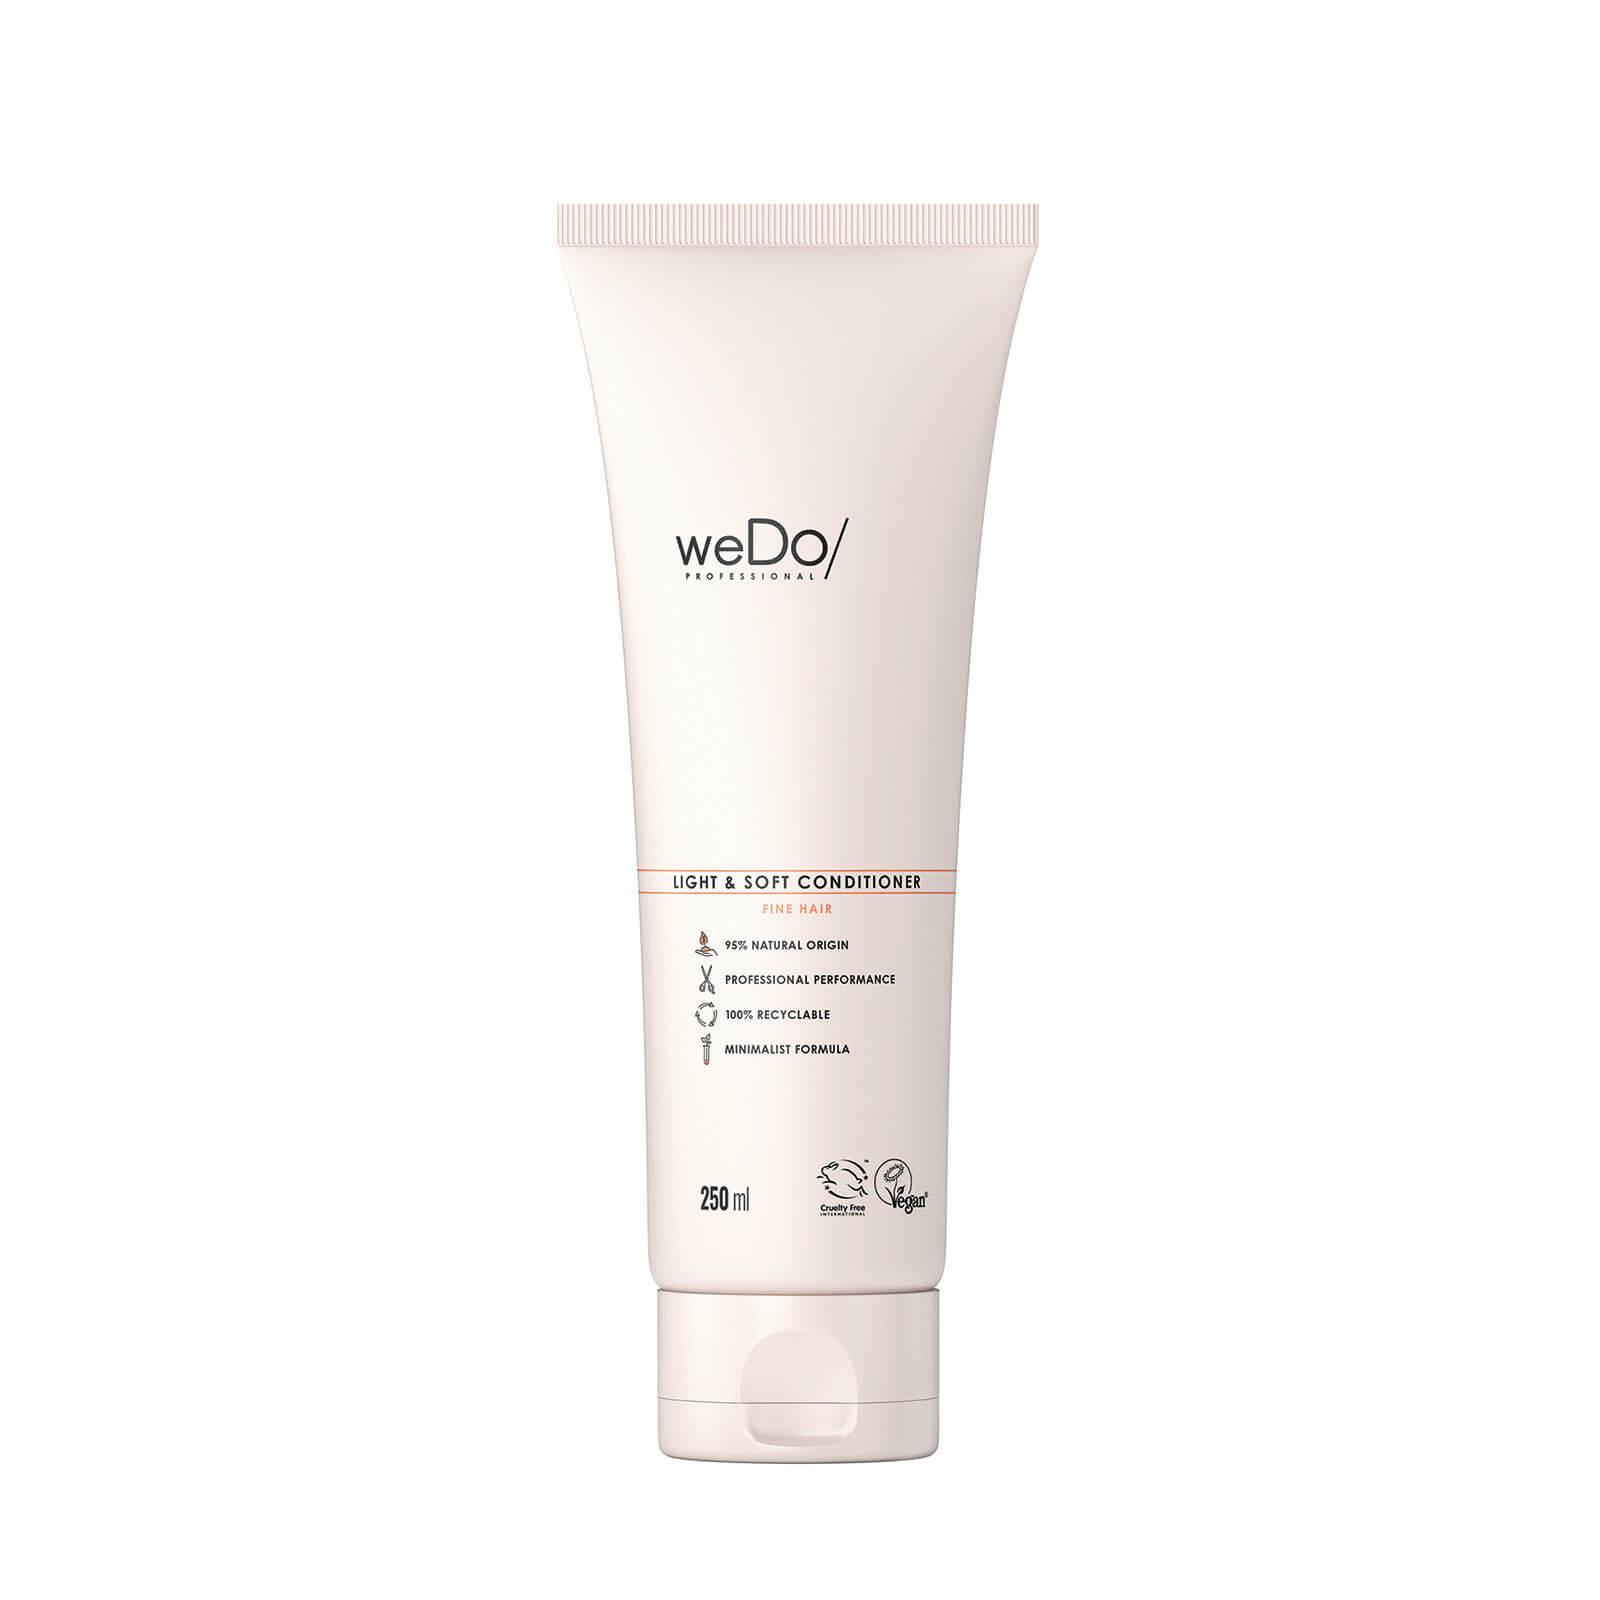 weDo/ Professional Light and Soft Conditioner 250ml